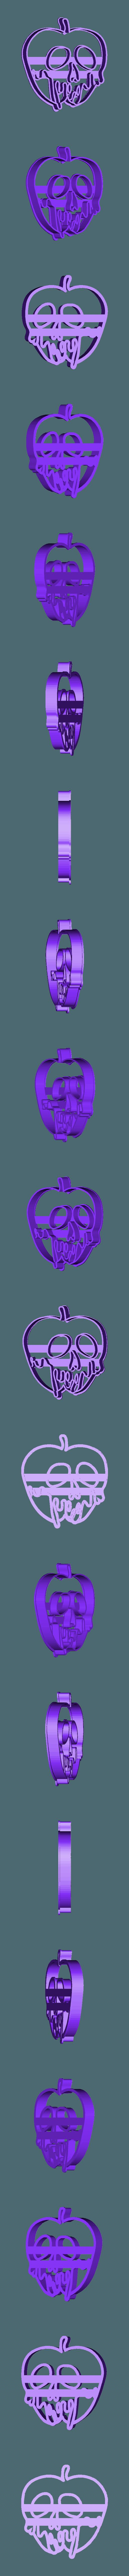 Poison Apple (2).stl Download STL file Poison apple White snow • 3D printer design, sofialavarra